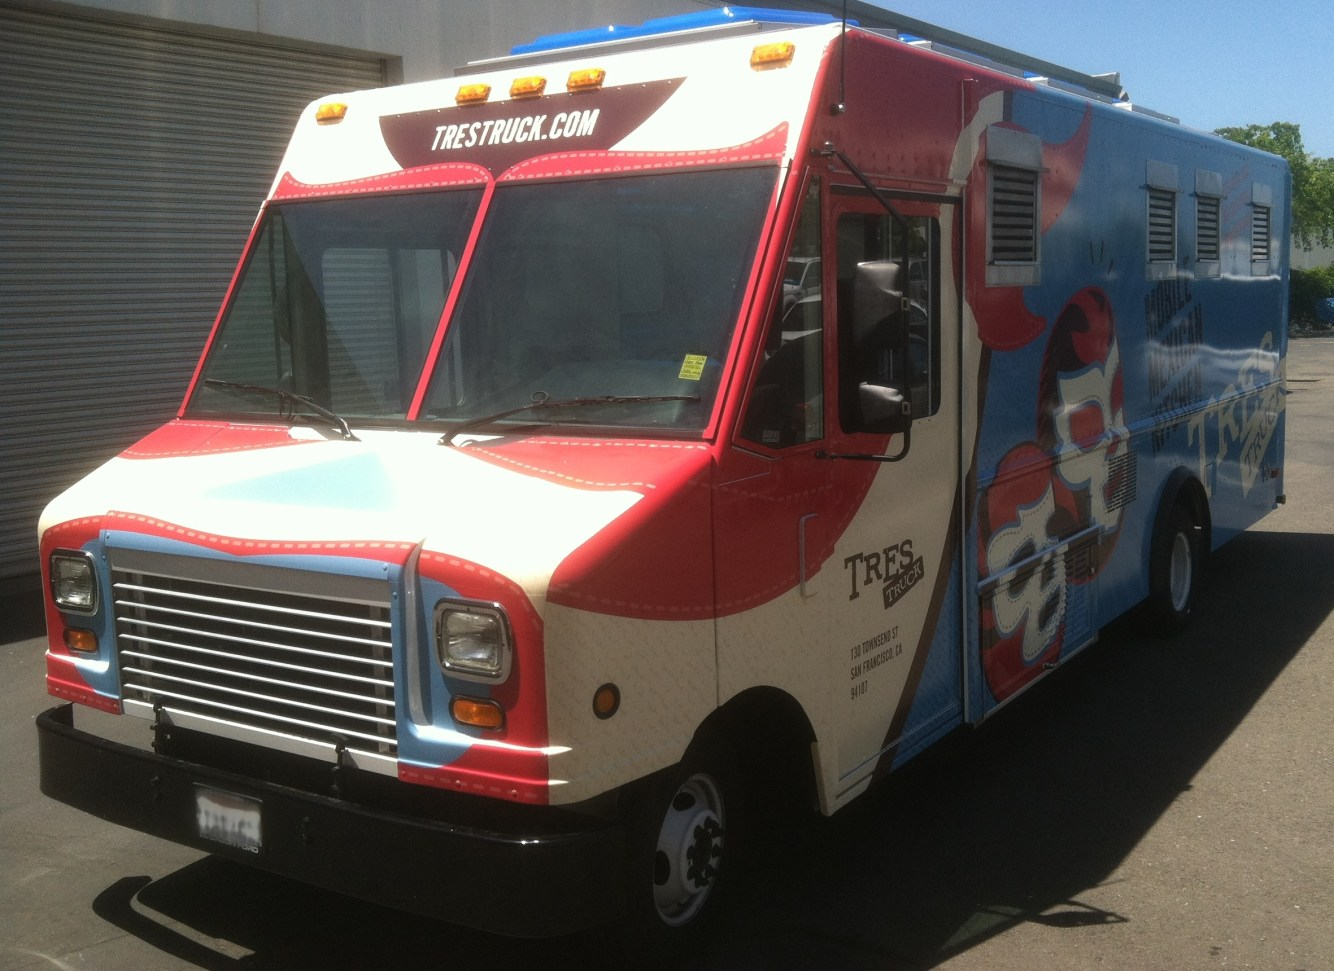 tres food truck wrap